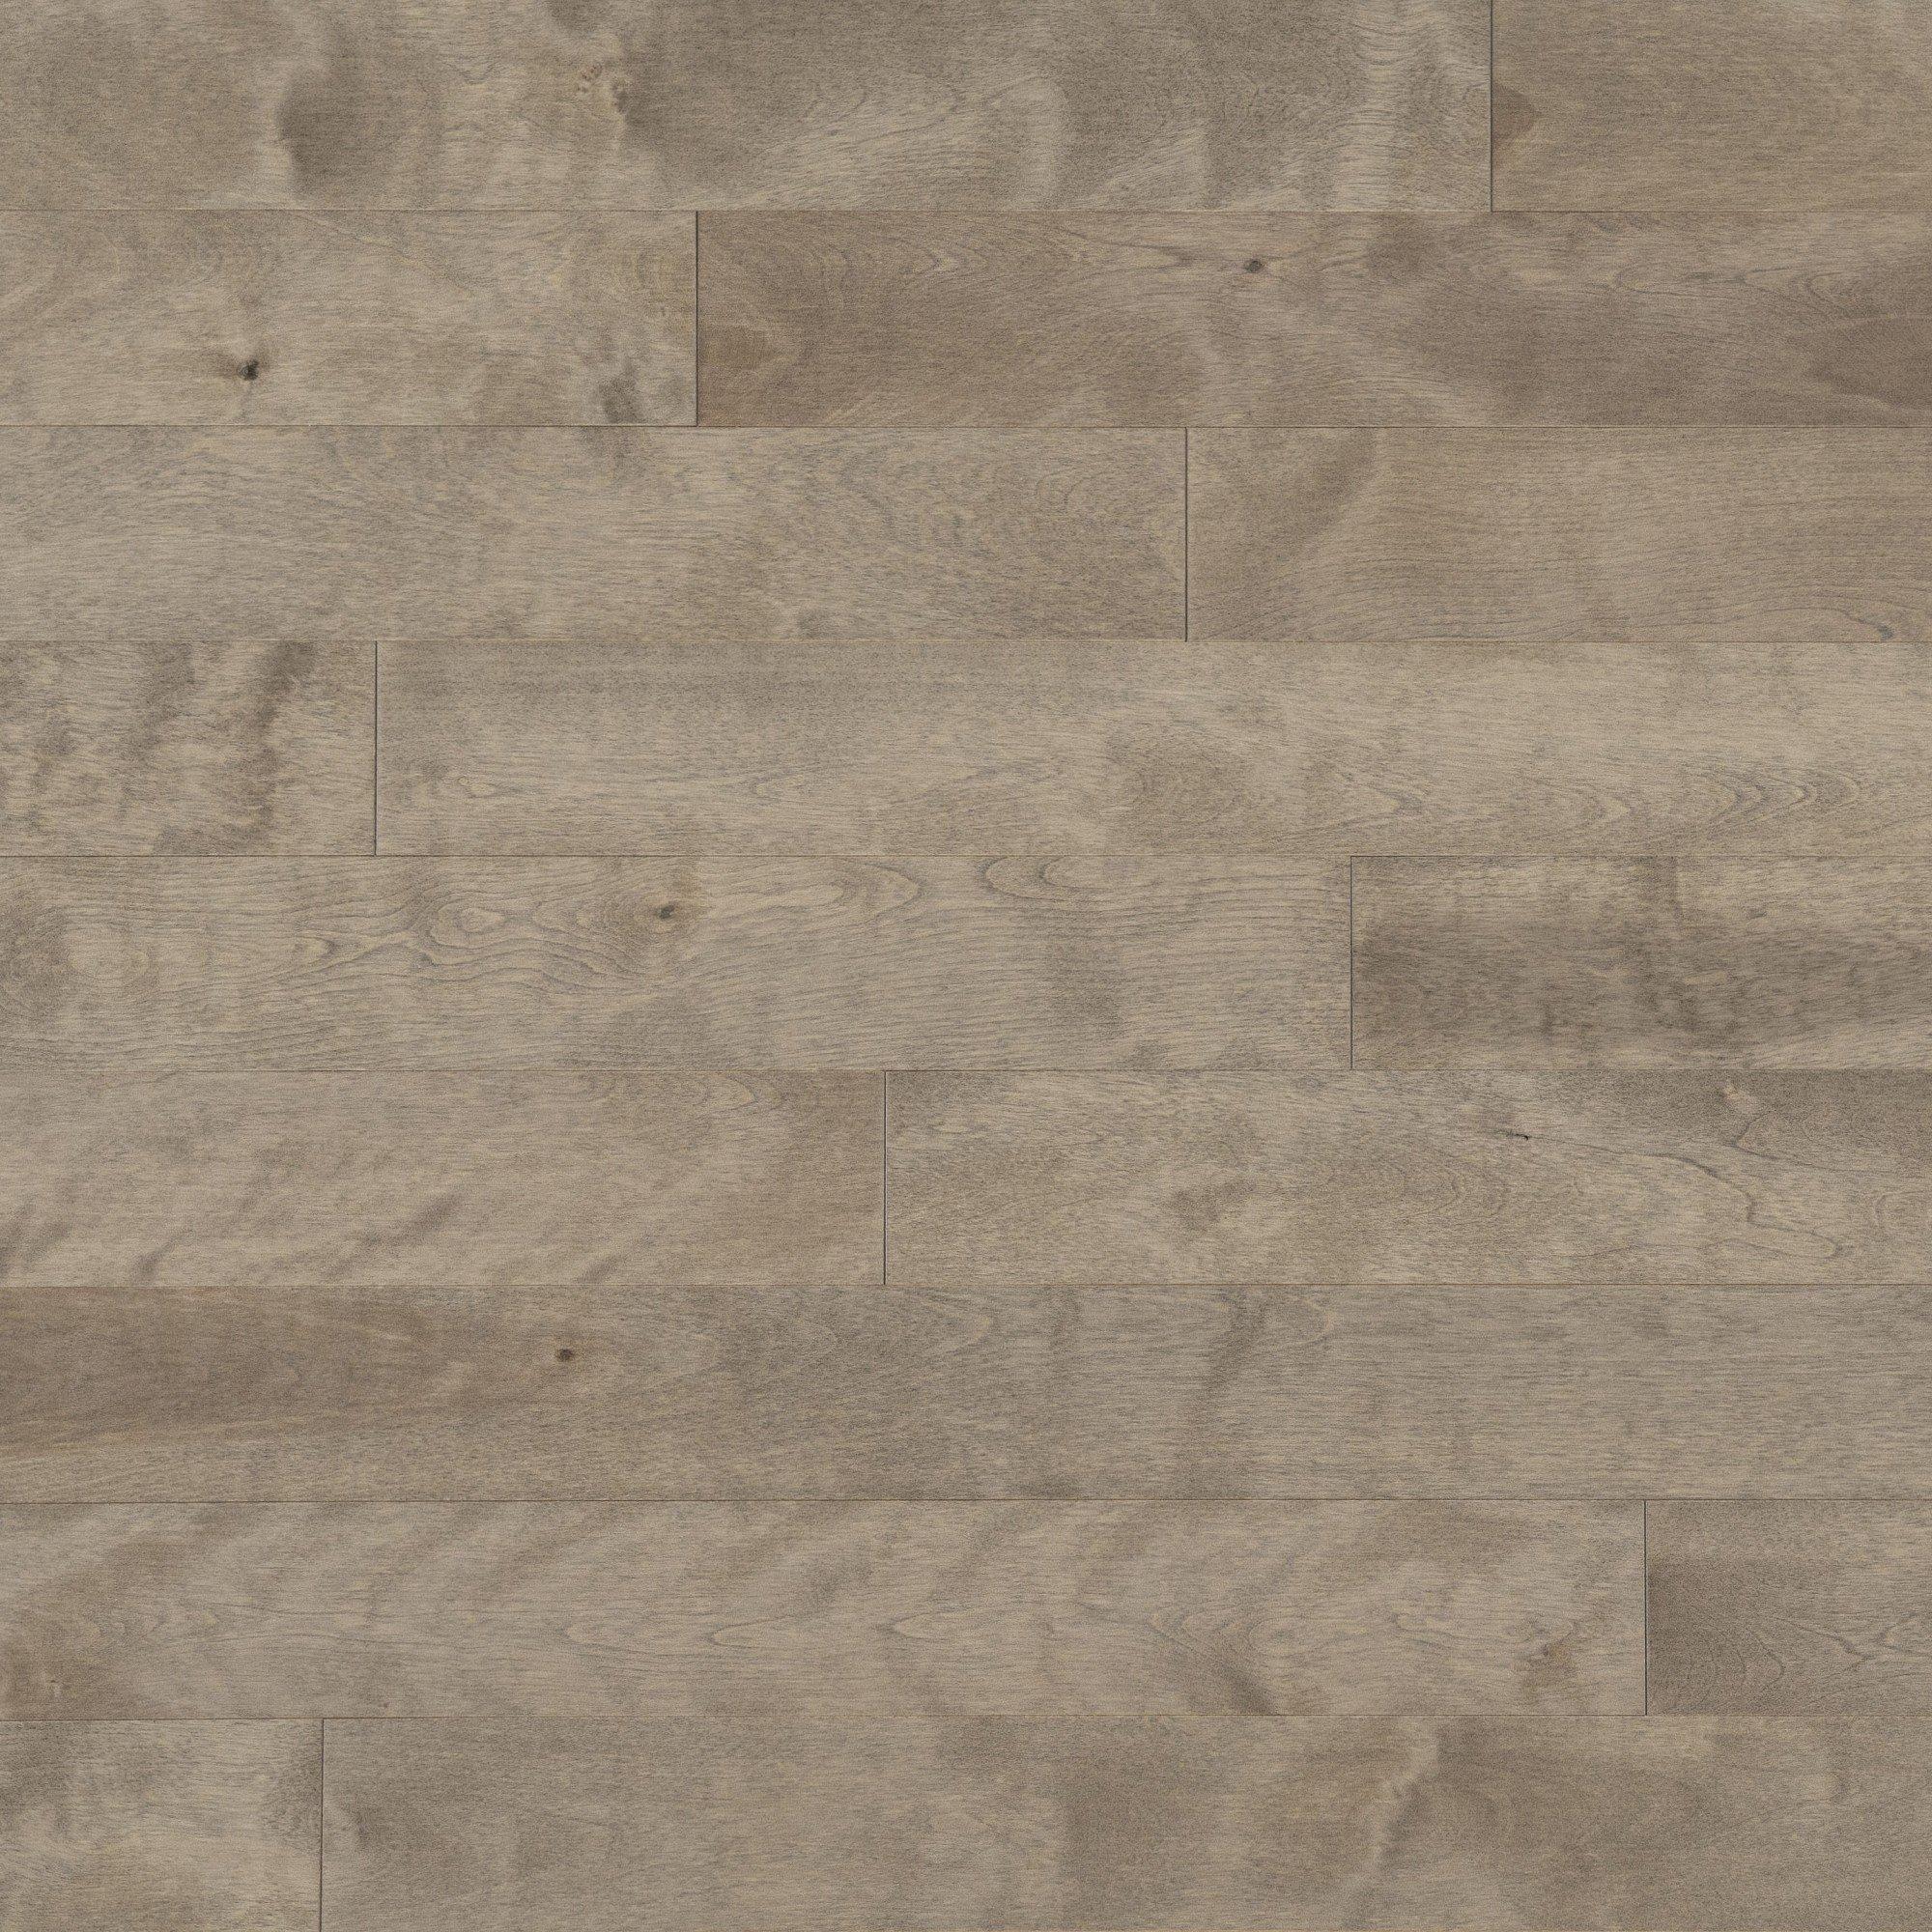 Merisier Rio Exclusive Lisse - Image plancher